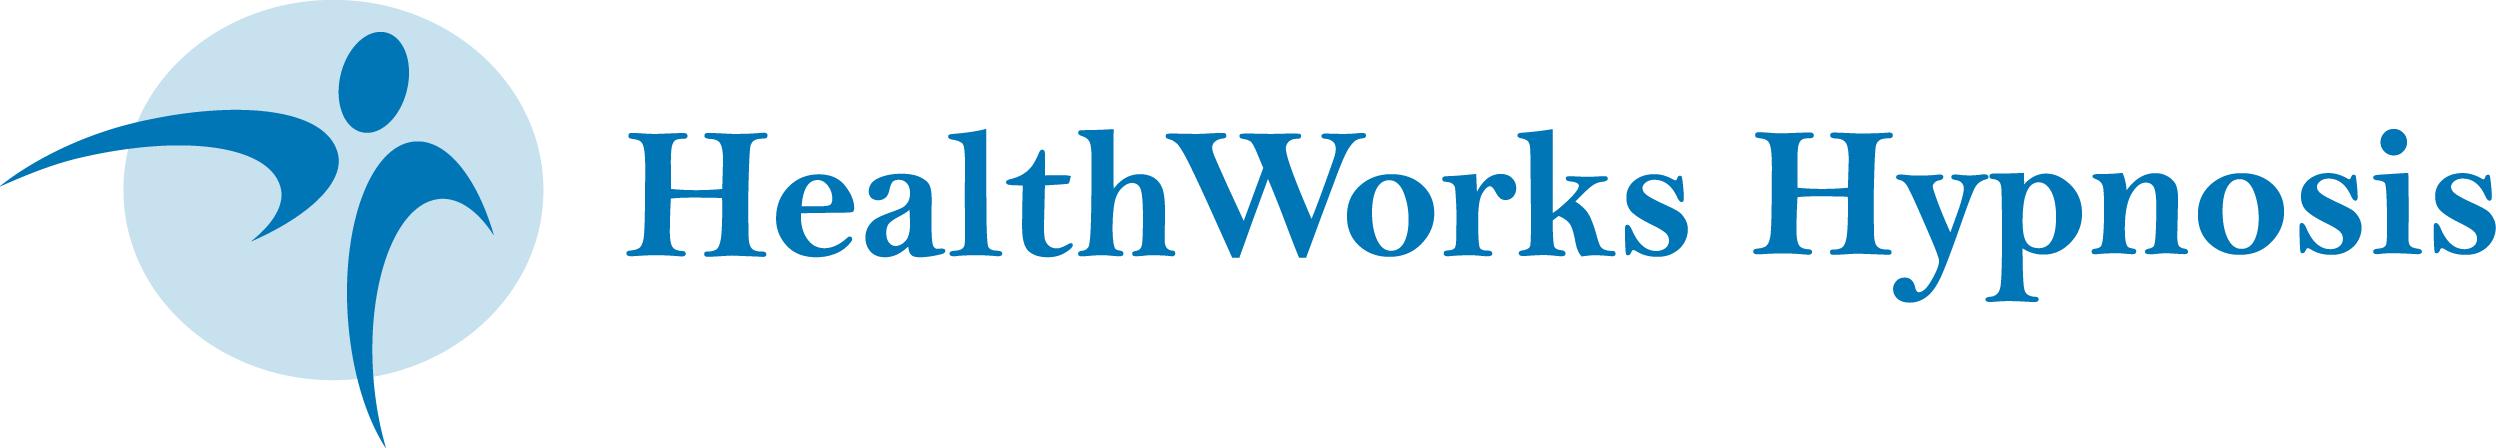 HealthWorks Hypnosis